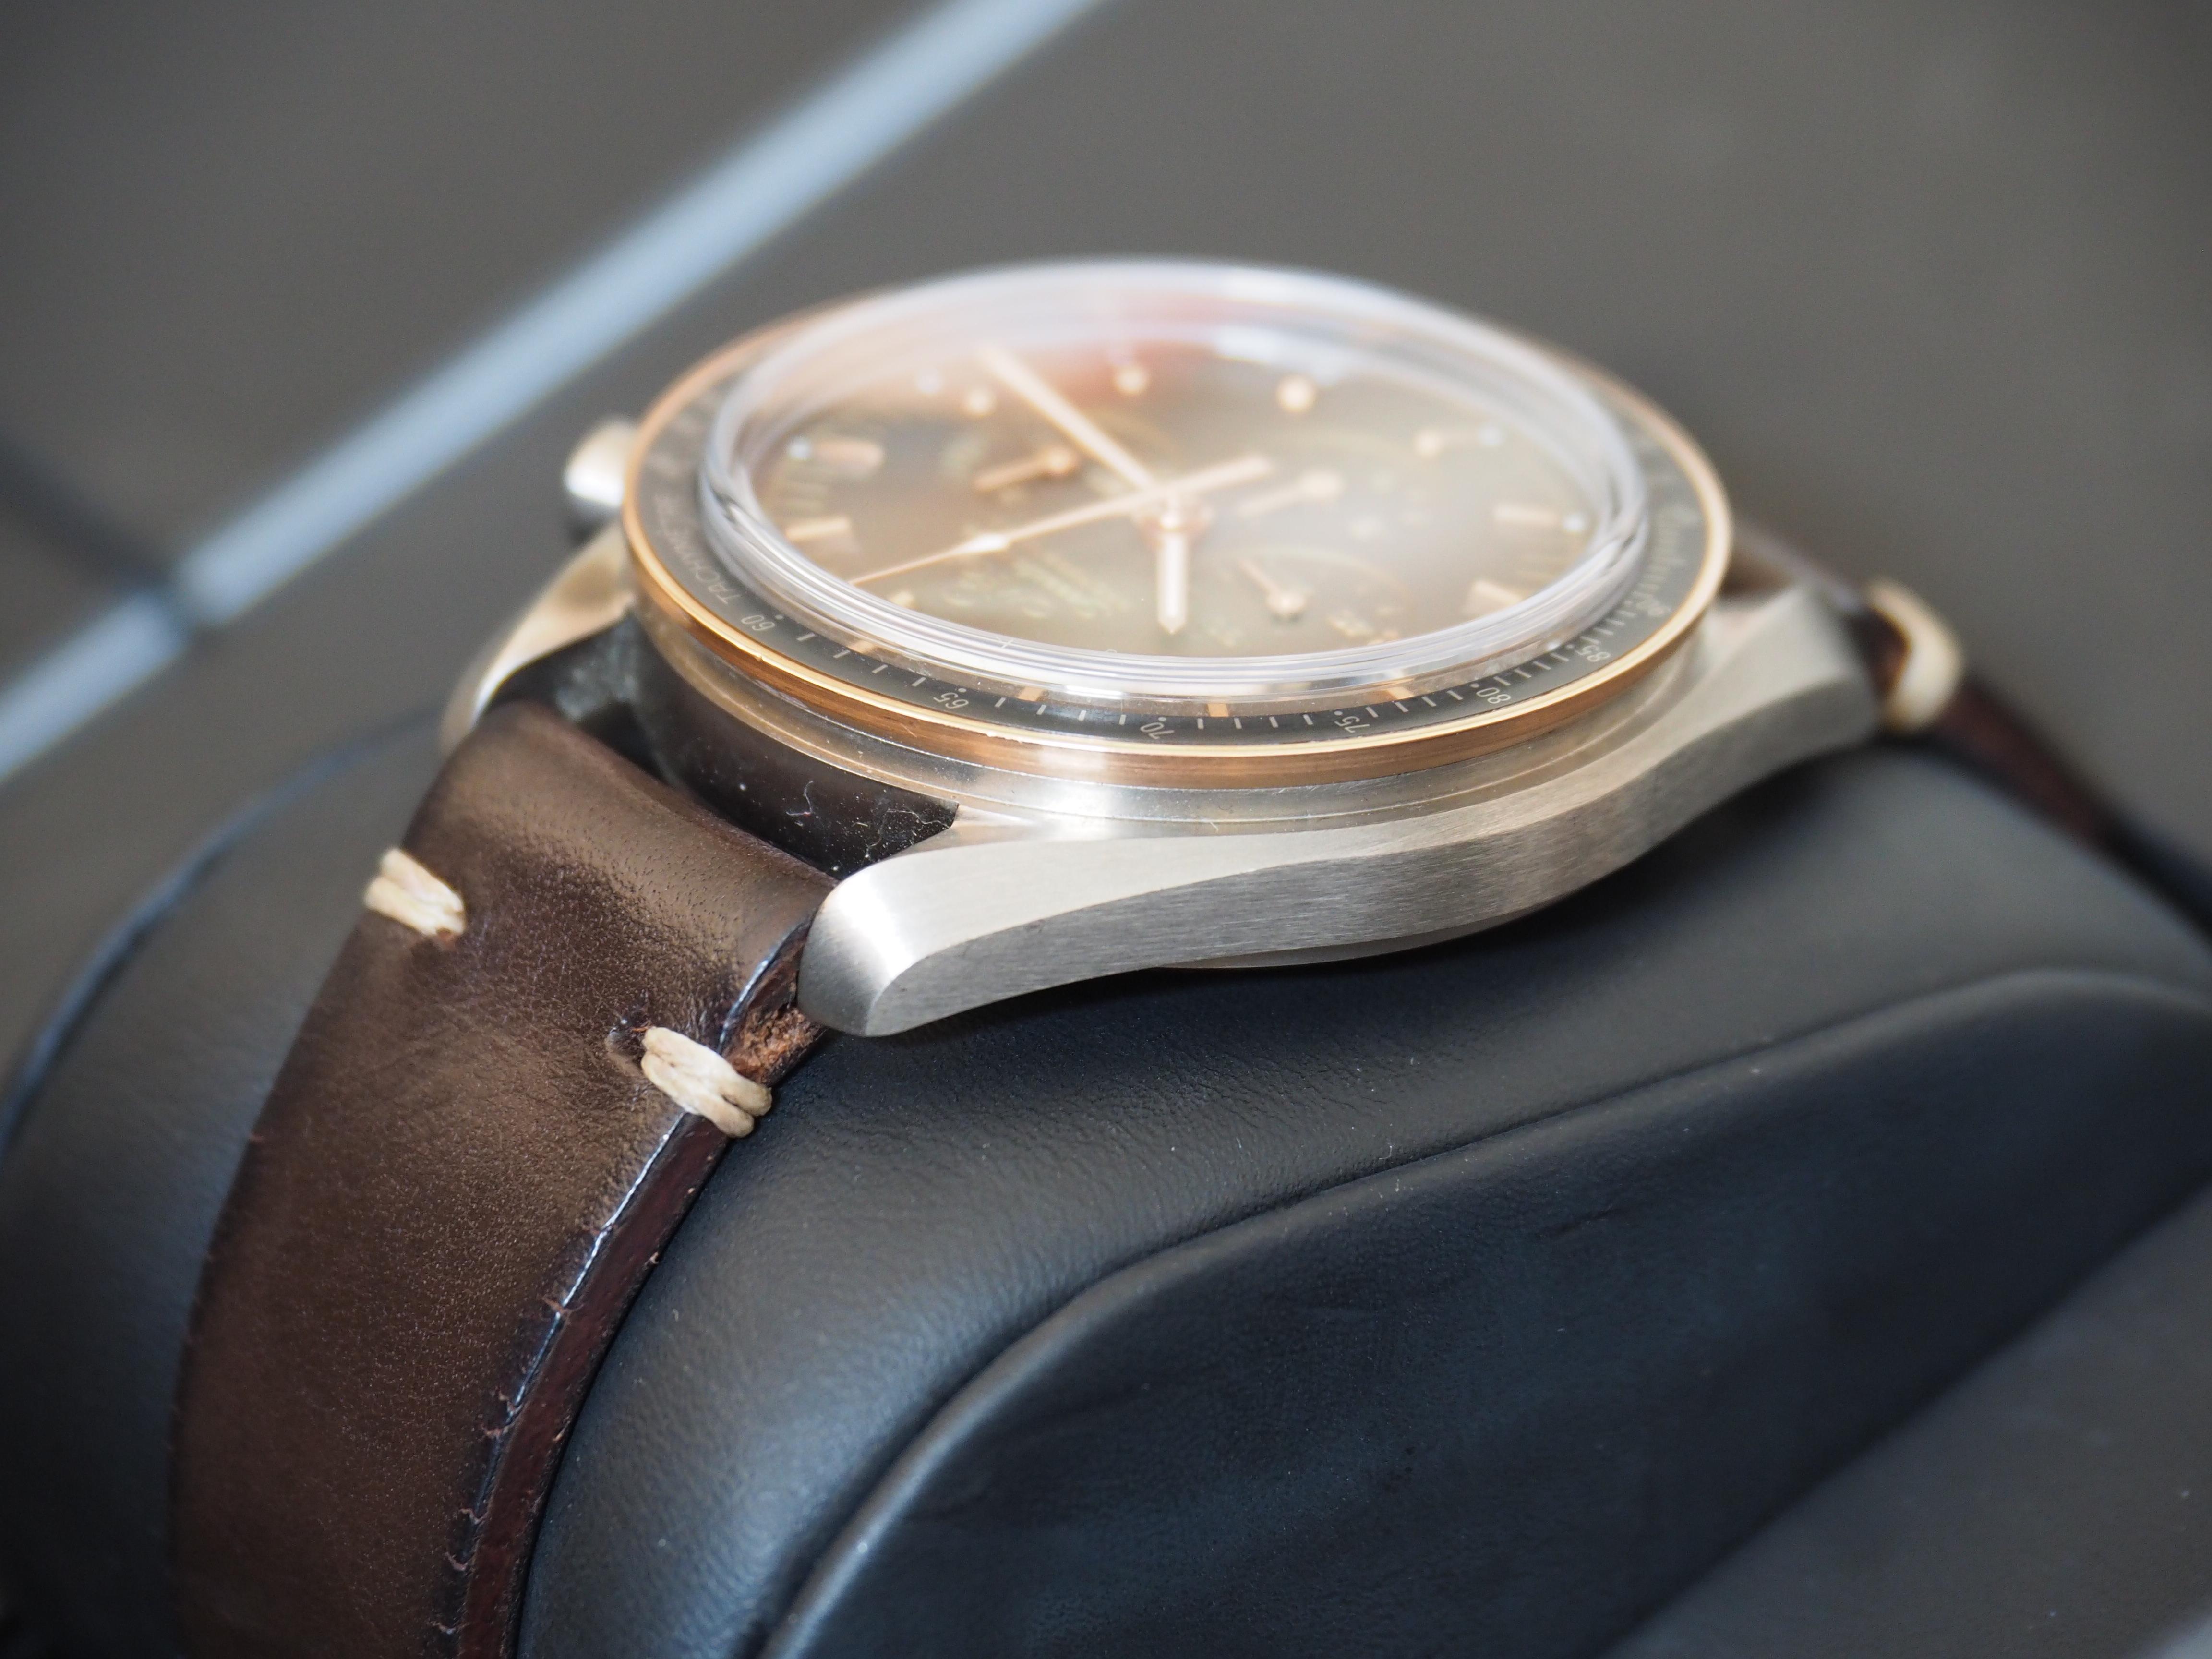 Omega Speedmaster Apollo 11 45th Anniversary Limited Edition watch